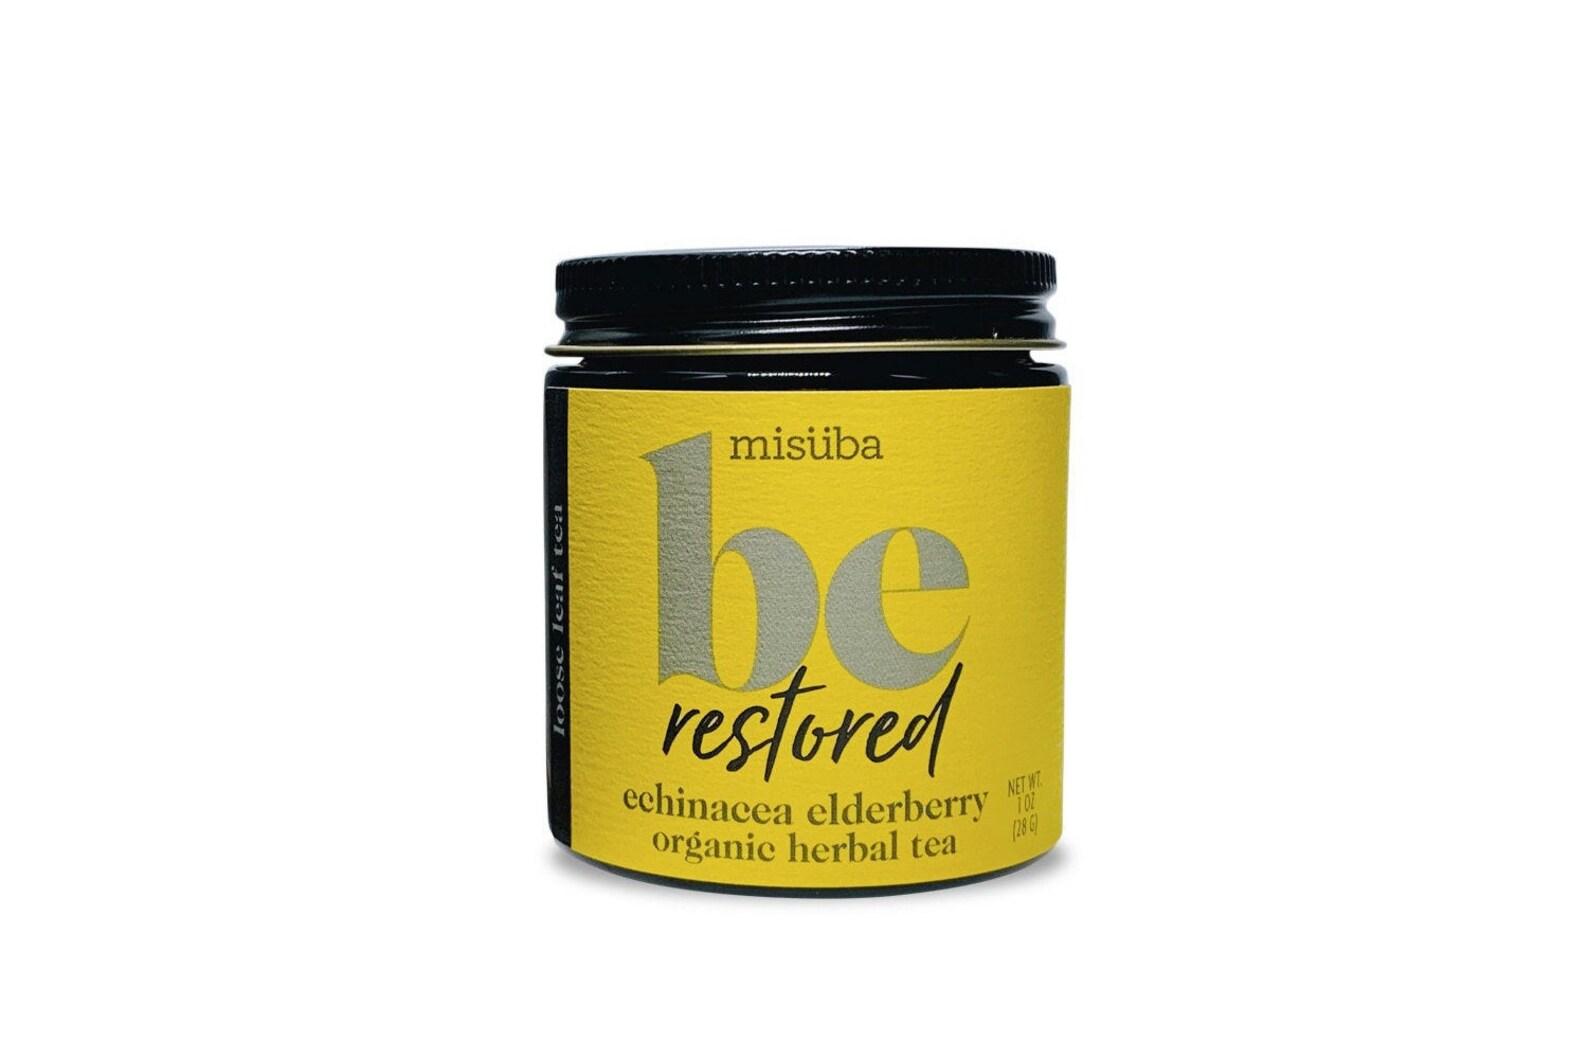 be restored | echinacea + elderberry tea